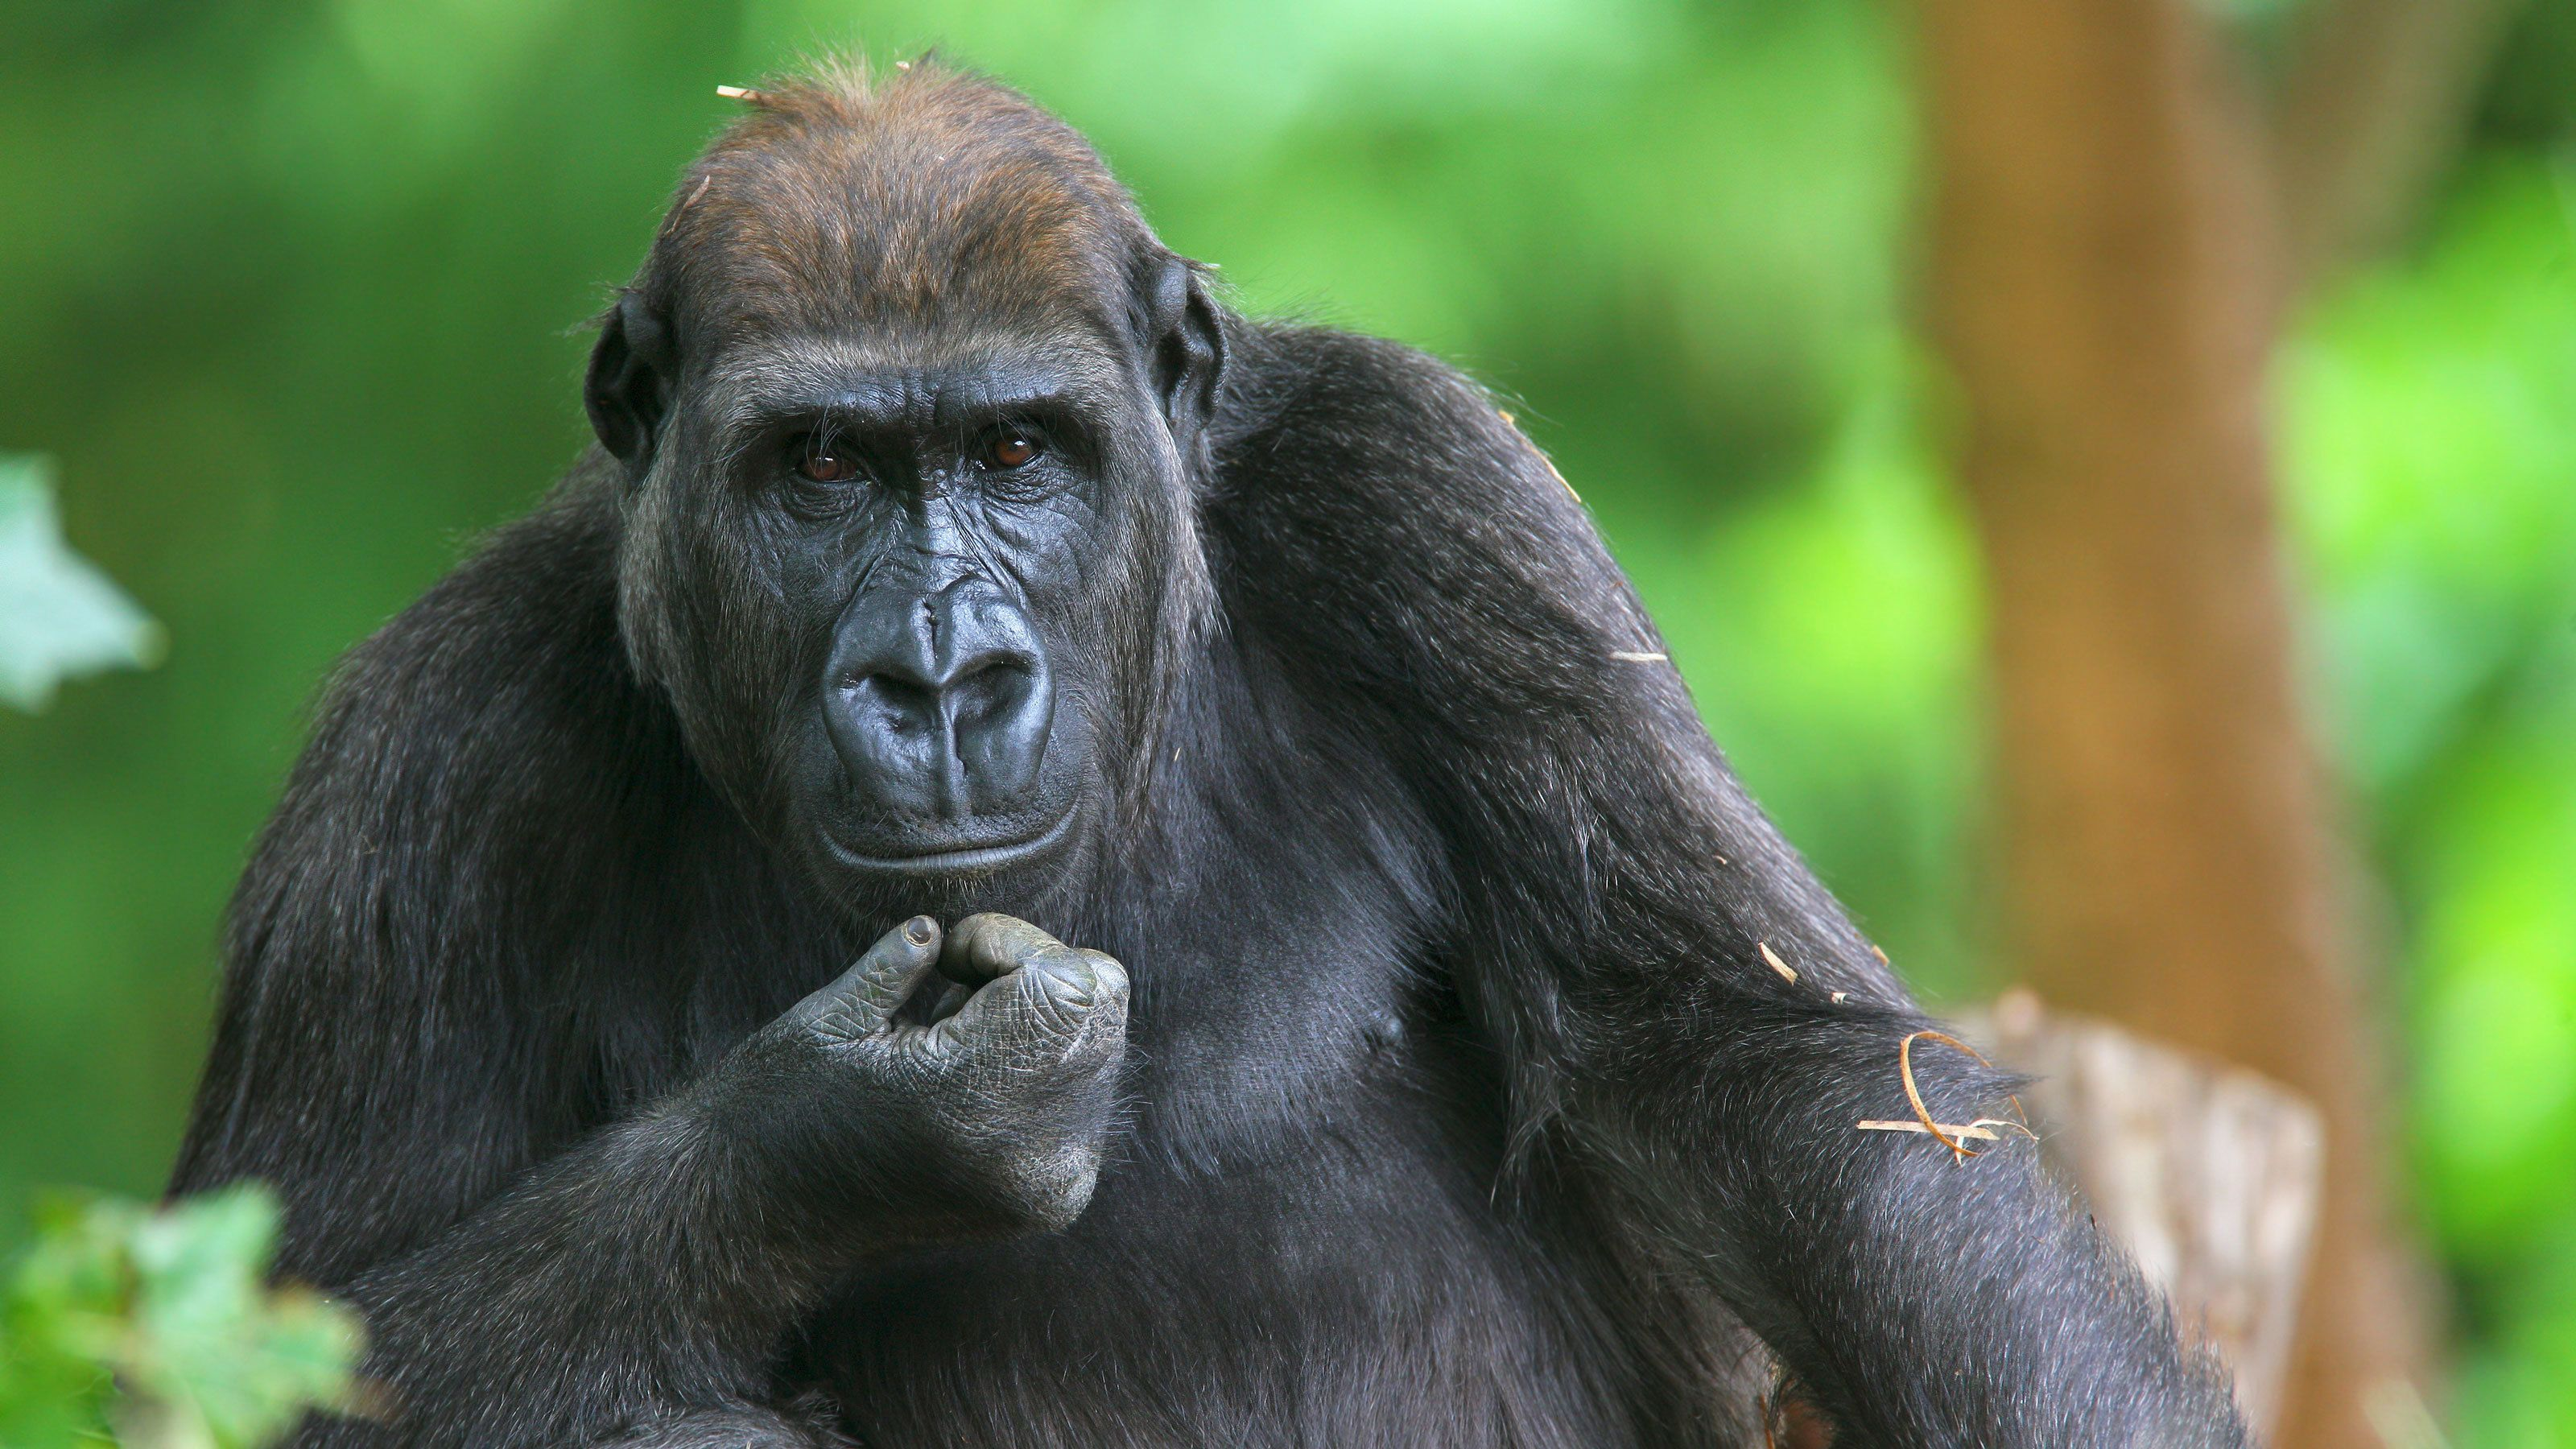 Gorilla at the Melbourne Zoo